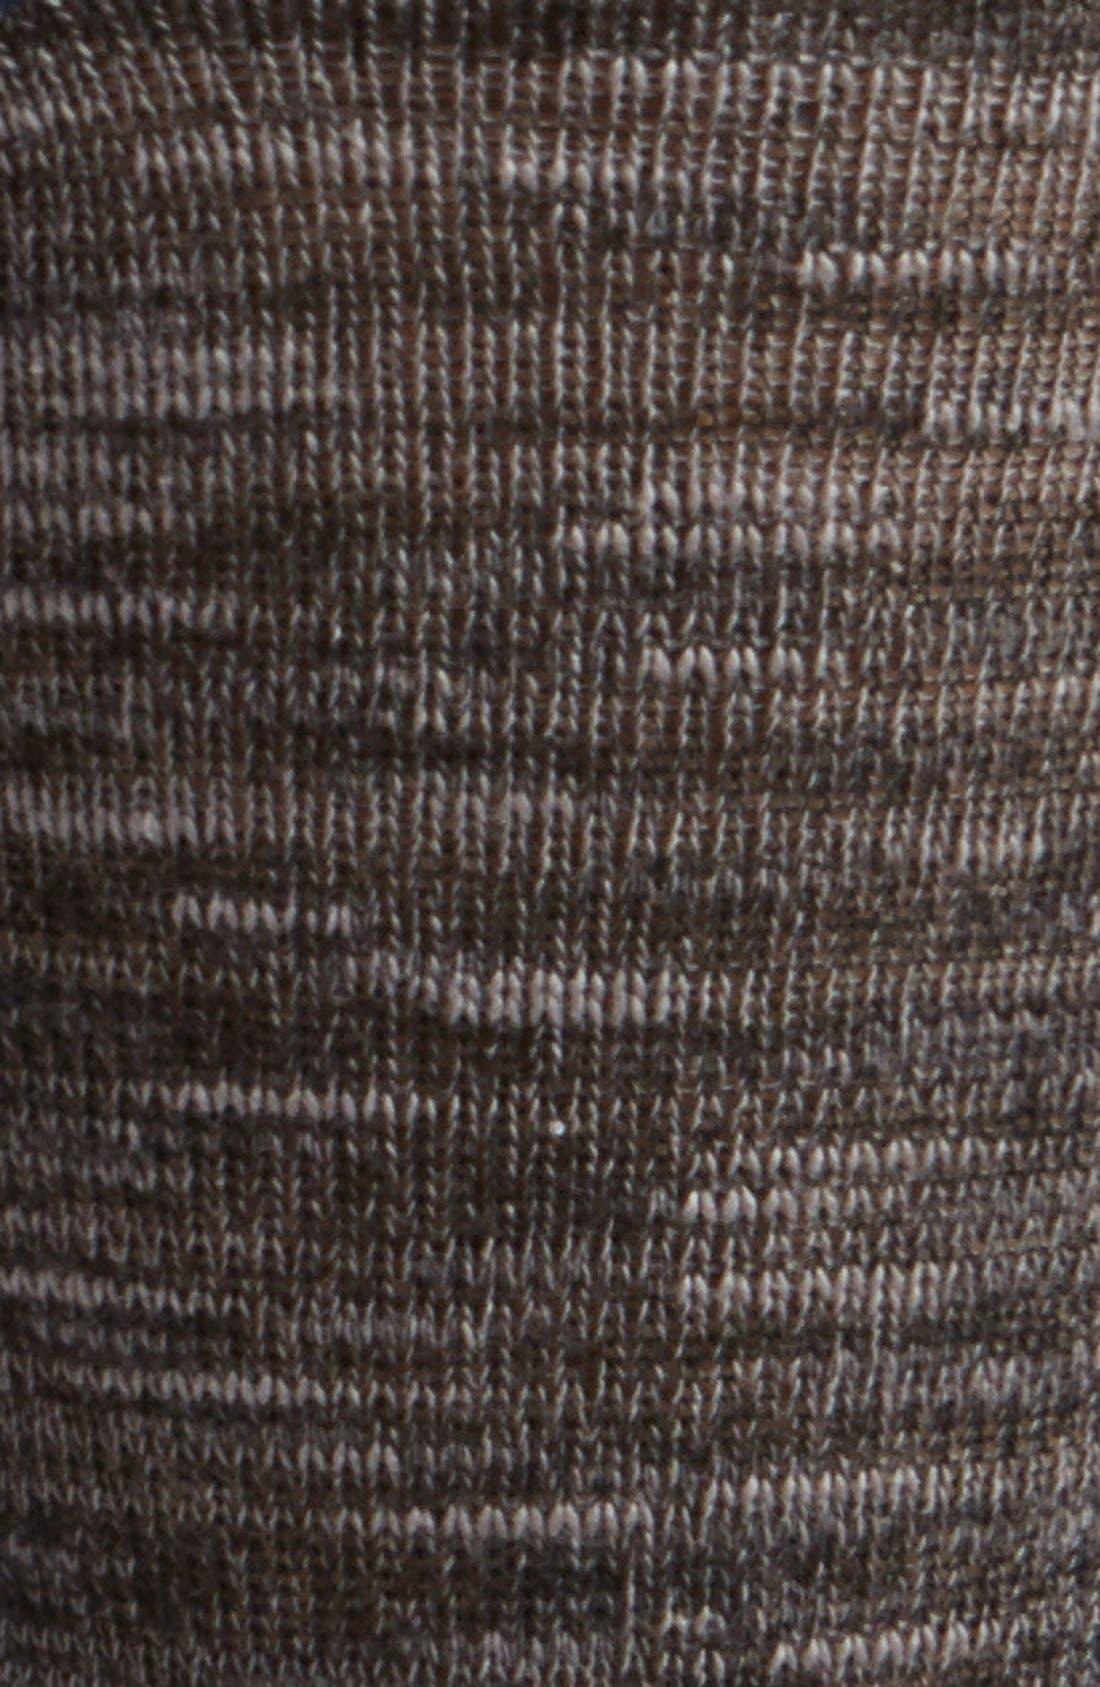 Cotton Blend Socks,                             Alternate thumbnail 2, color,                             003